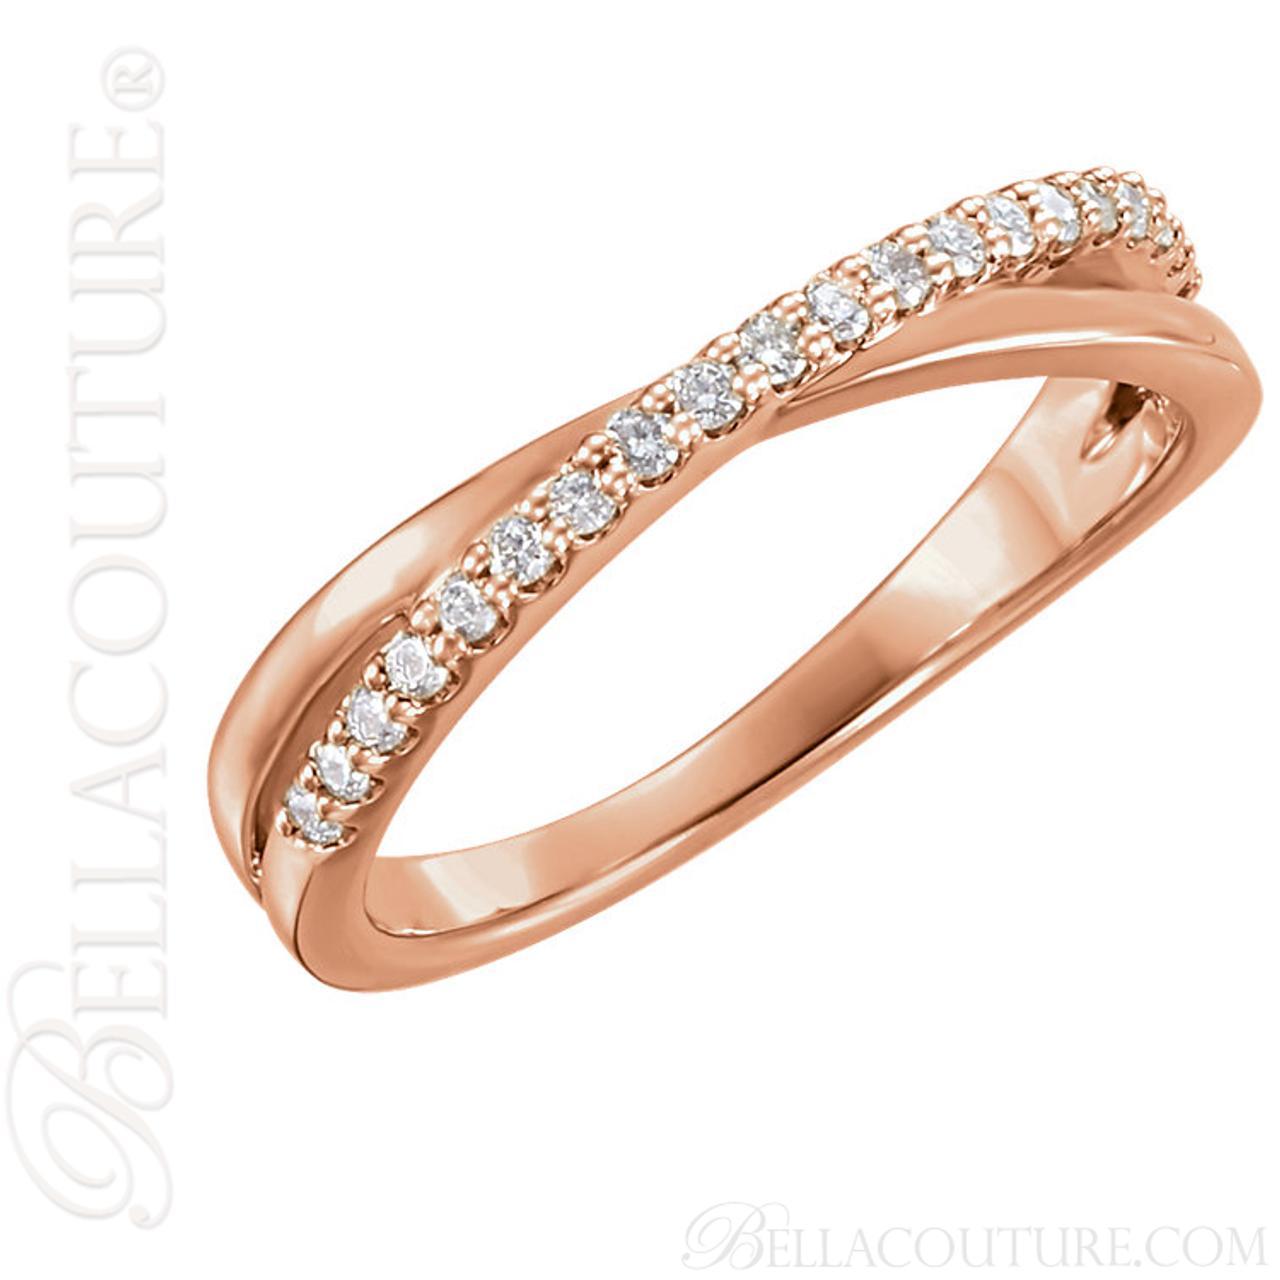 NEW BELLA COUTURE GENA Fine Gorgeous Diamond Criss Cross 14K Rose